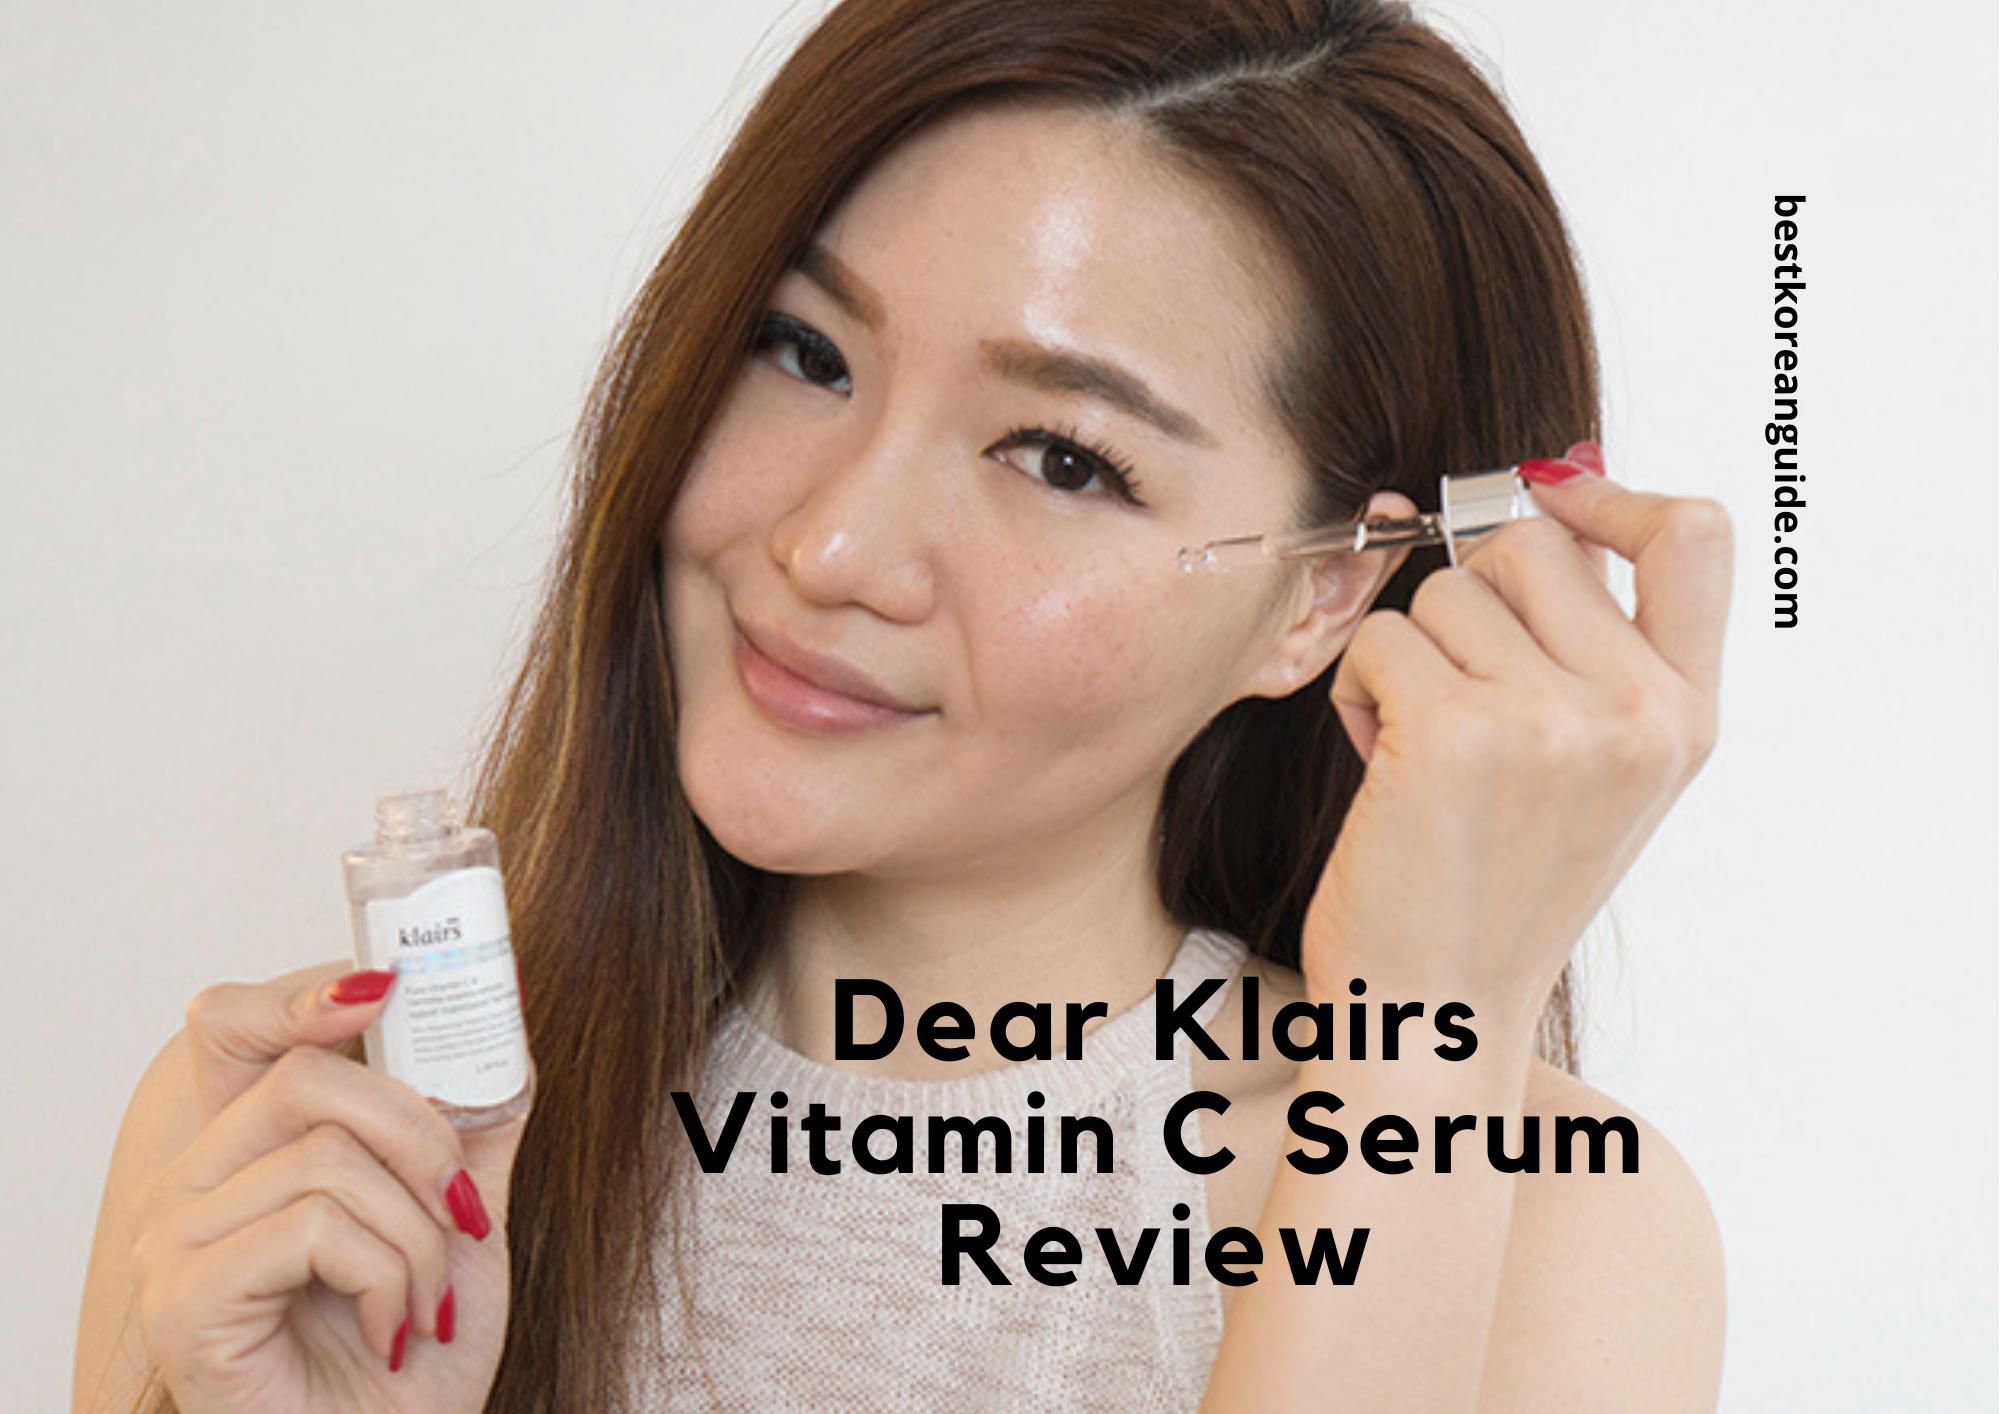 Dear Klairs Vitamin C Serum Review